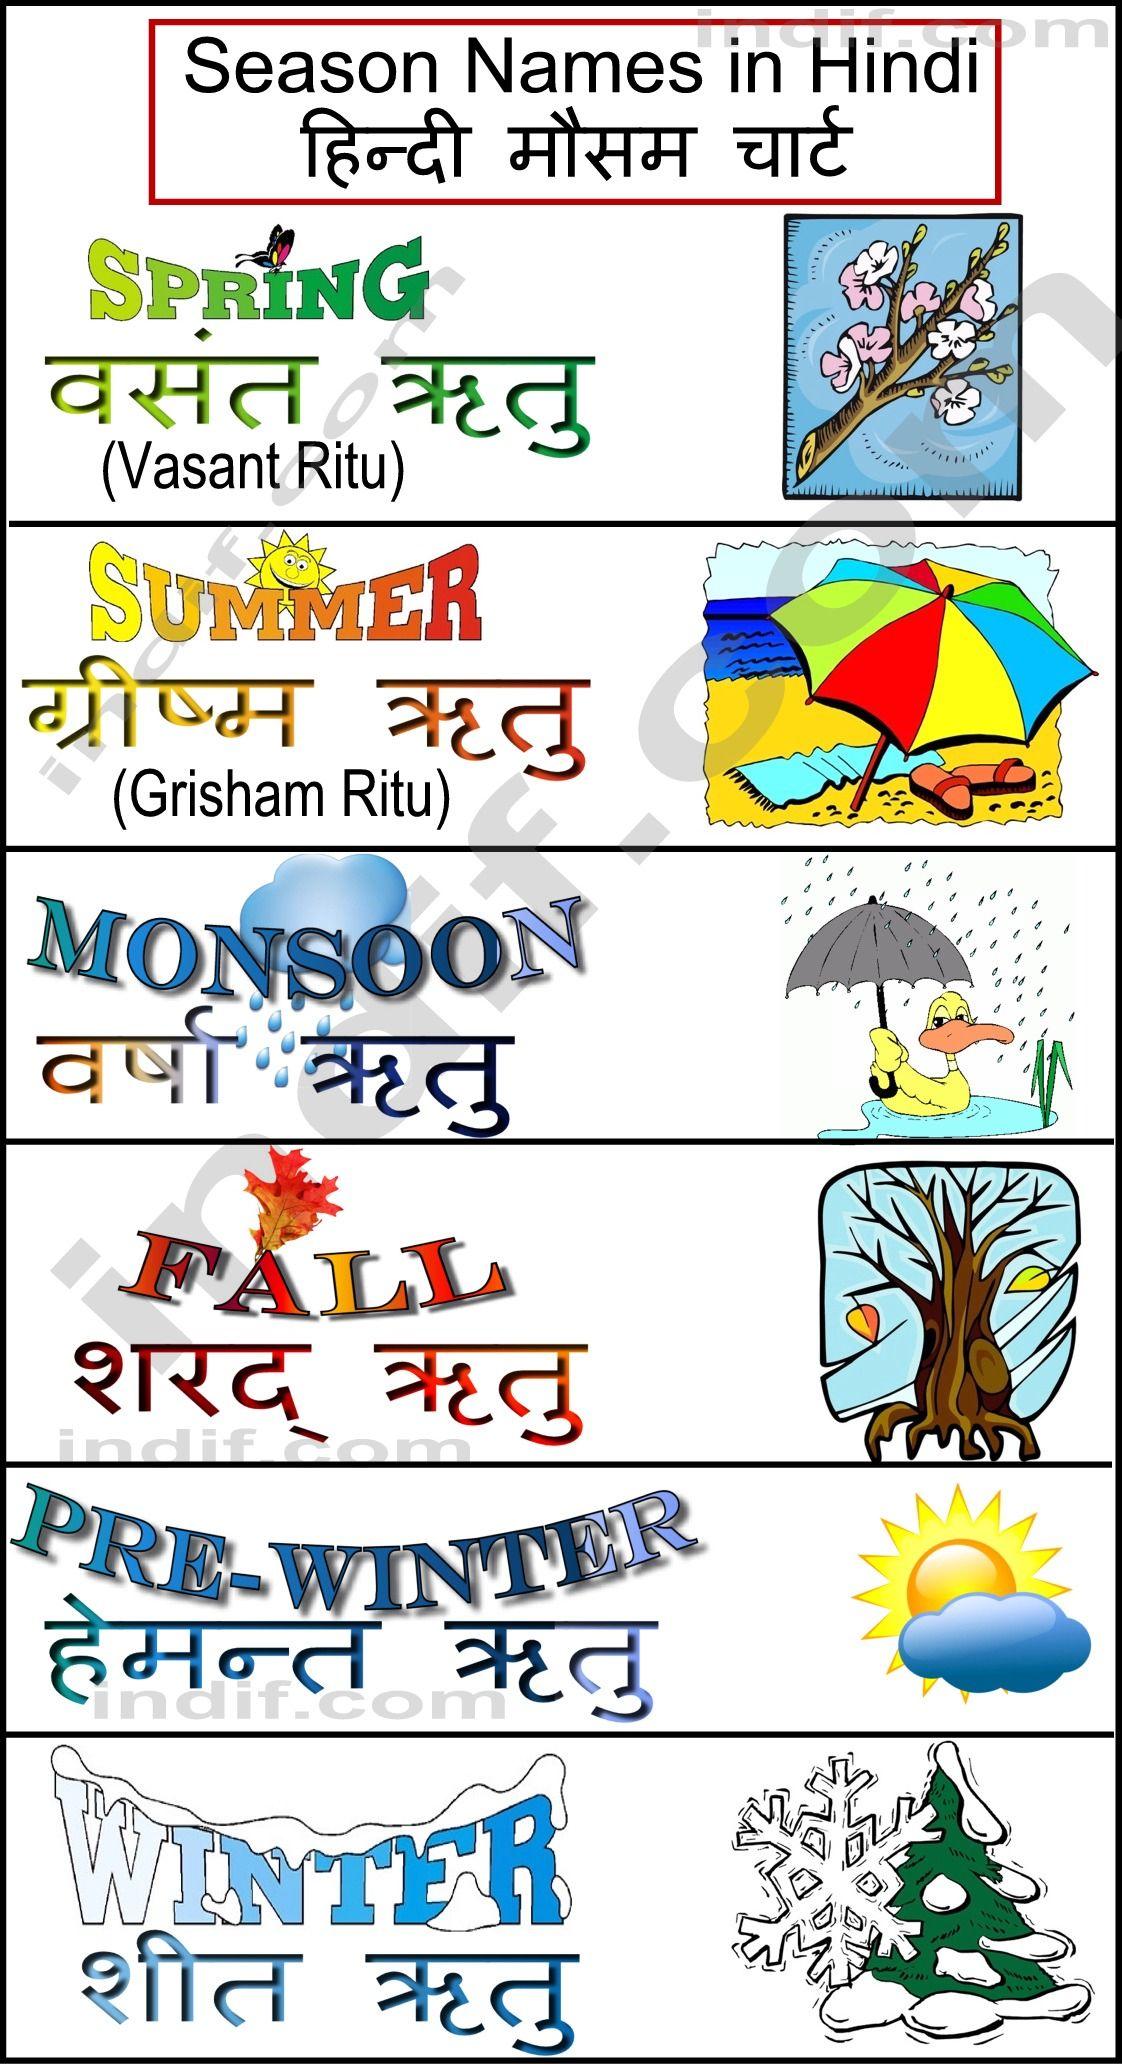 Essay on zoo in sanskrit language